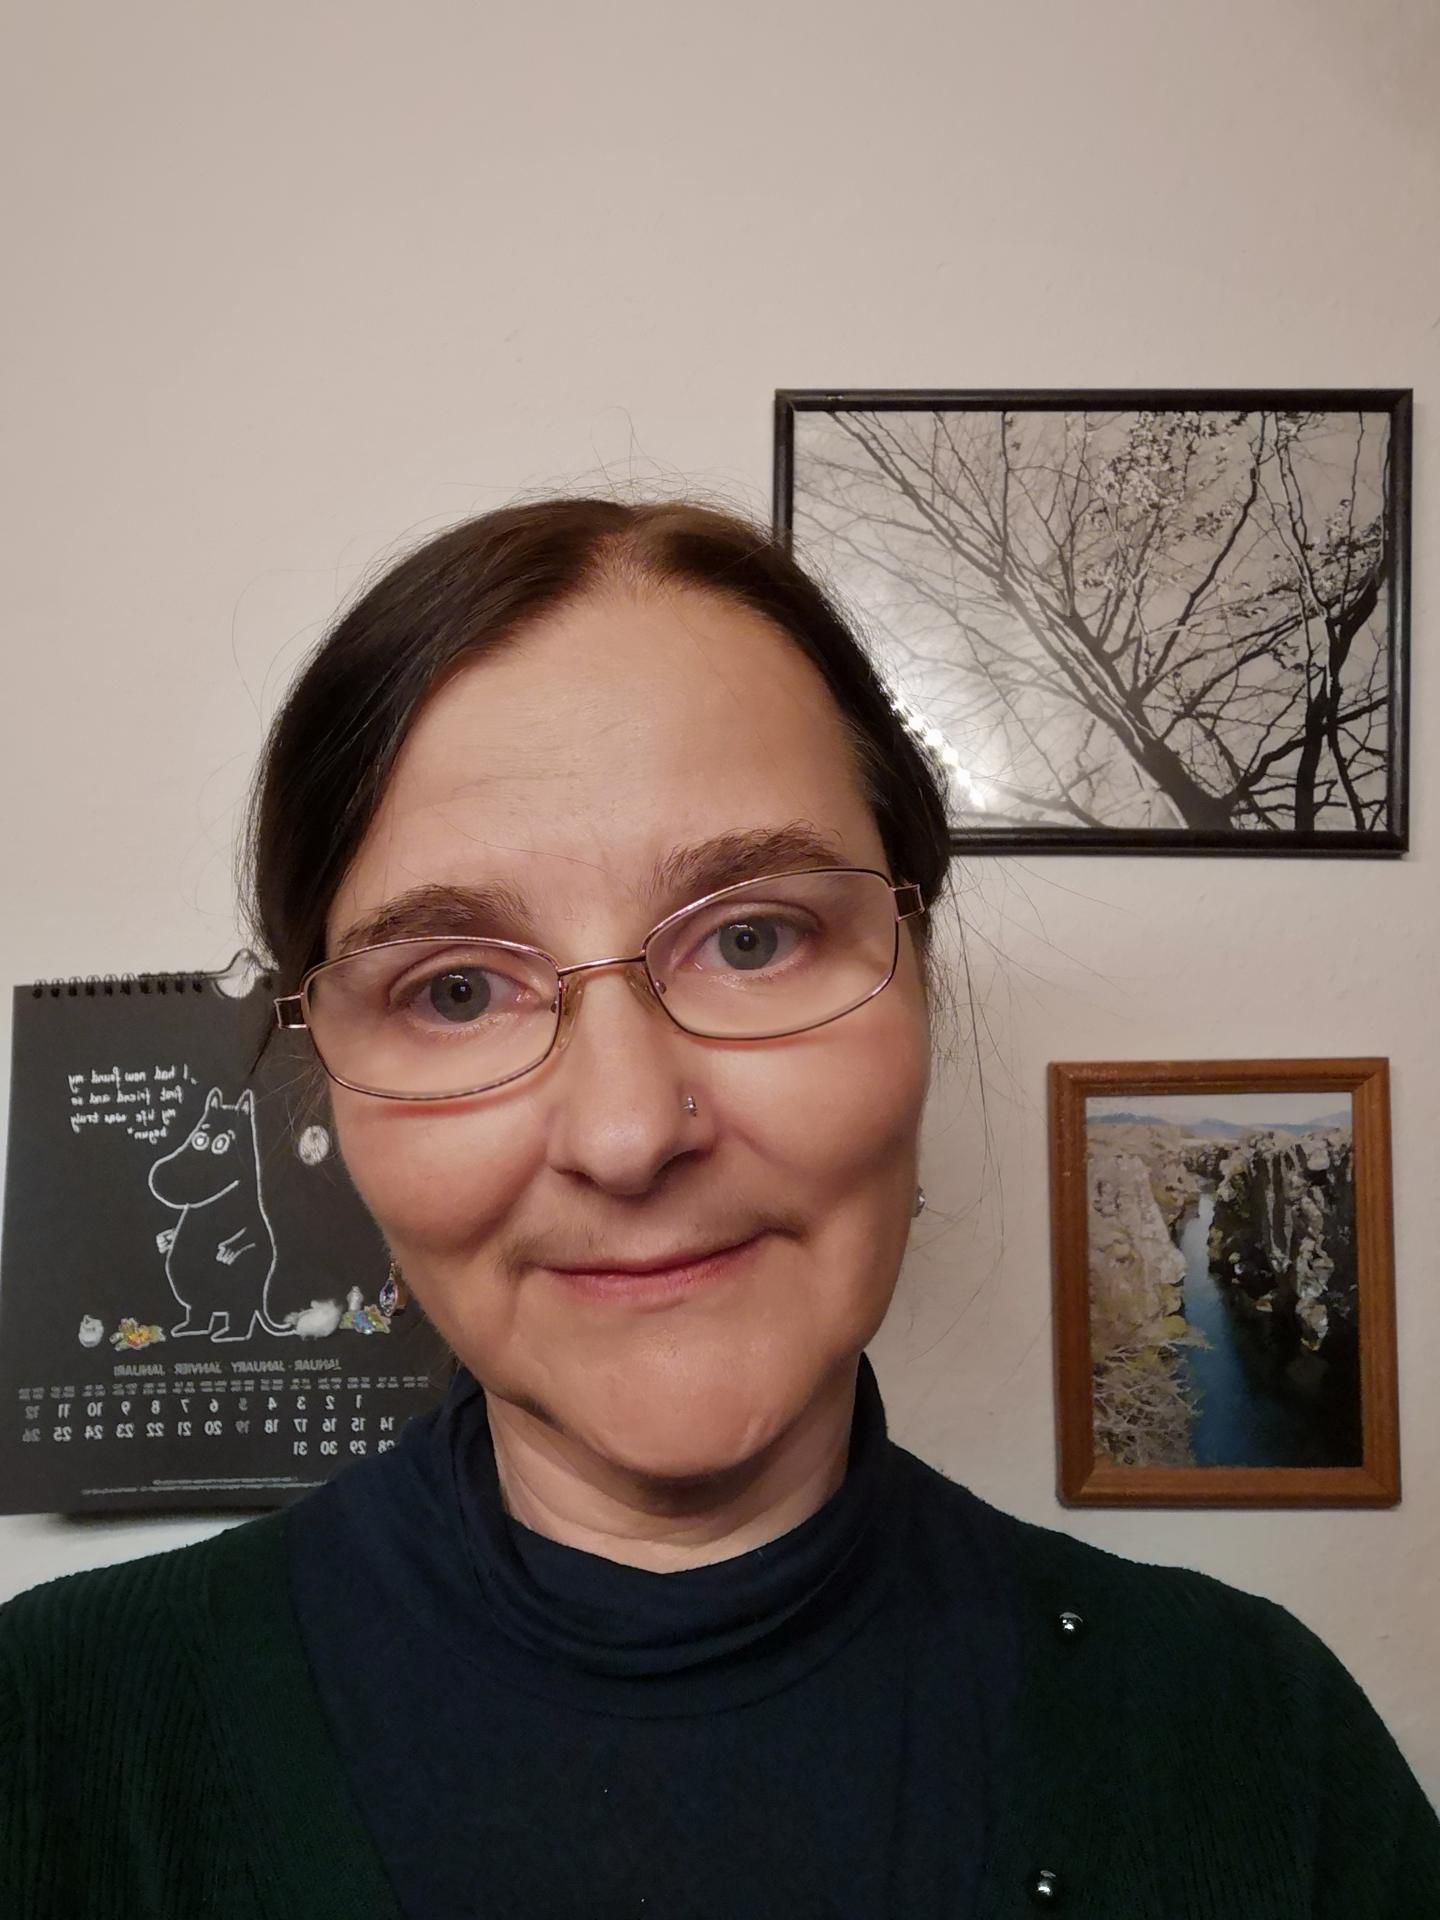 Olga Bungardt